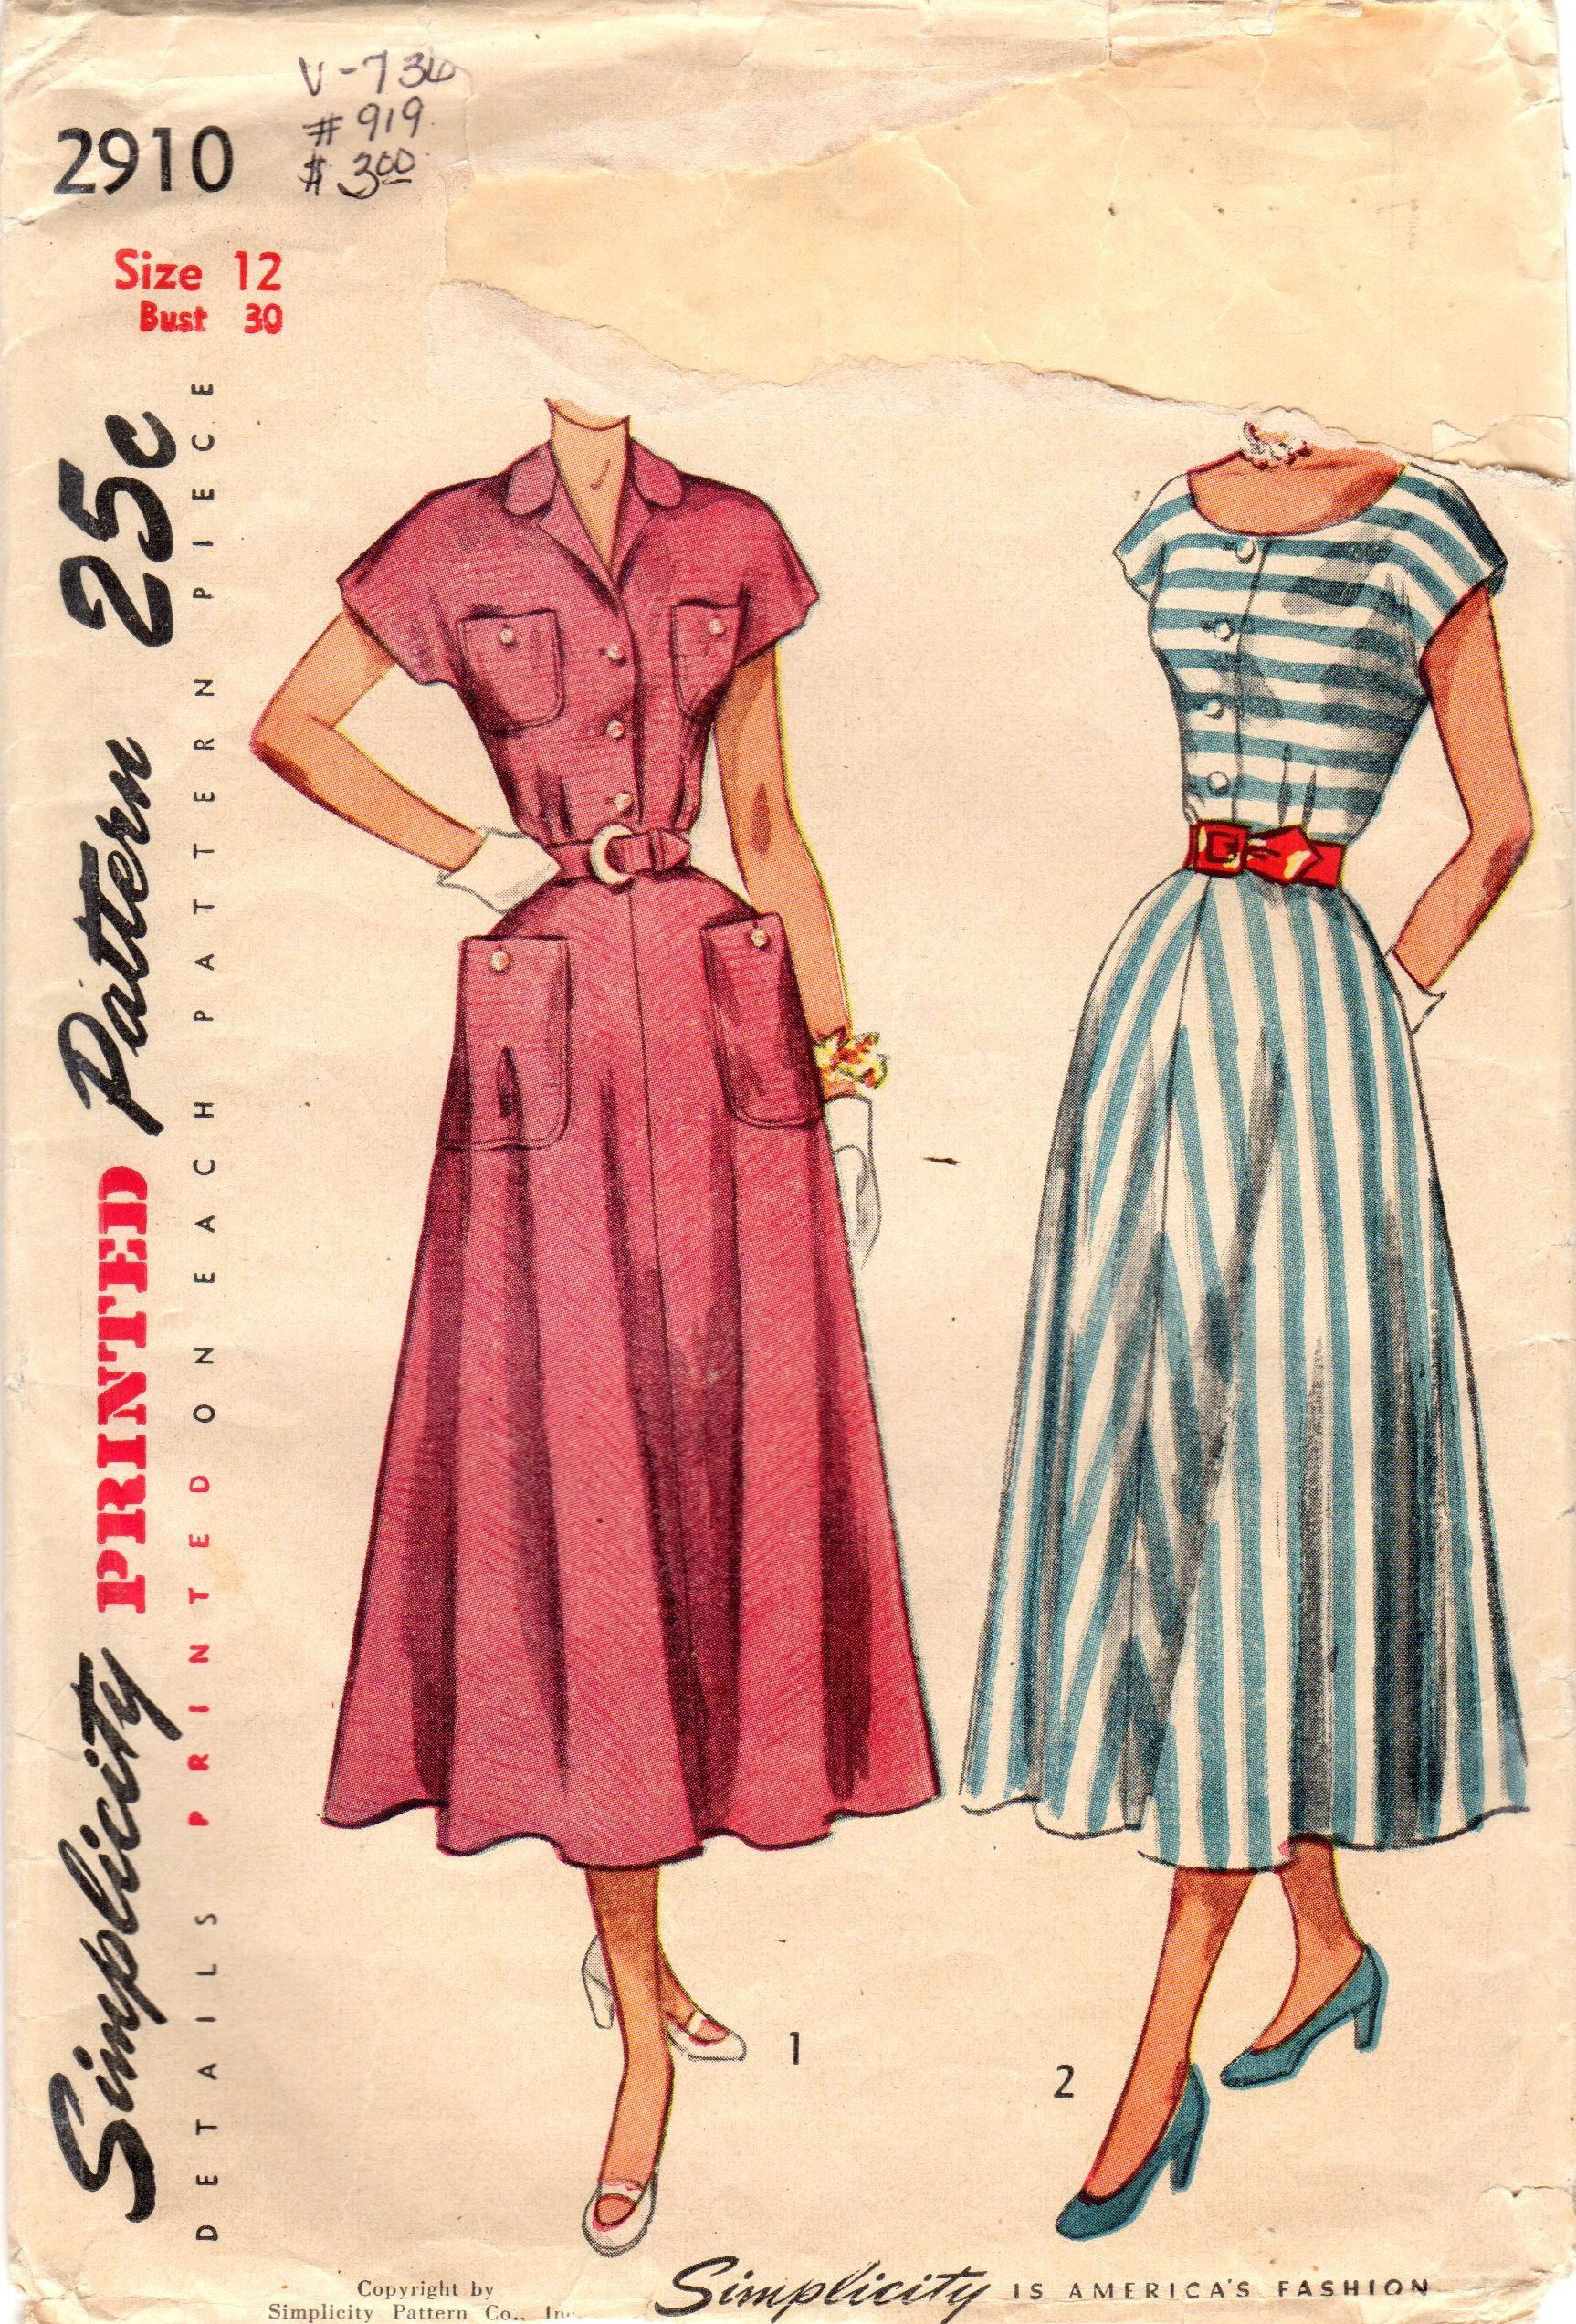 1940s Simplicity 2910 Vintage Sewing Pattern Misses Shirtwaist Dress Tea Length Dress Siz Retro Dress Pattern Tea Length Dress Patterns Vintage Dress Patterns